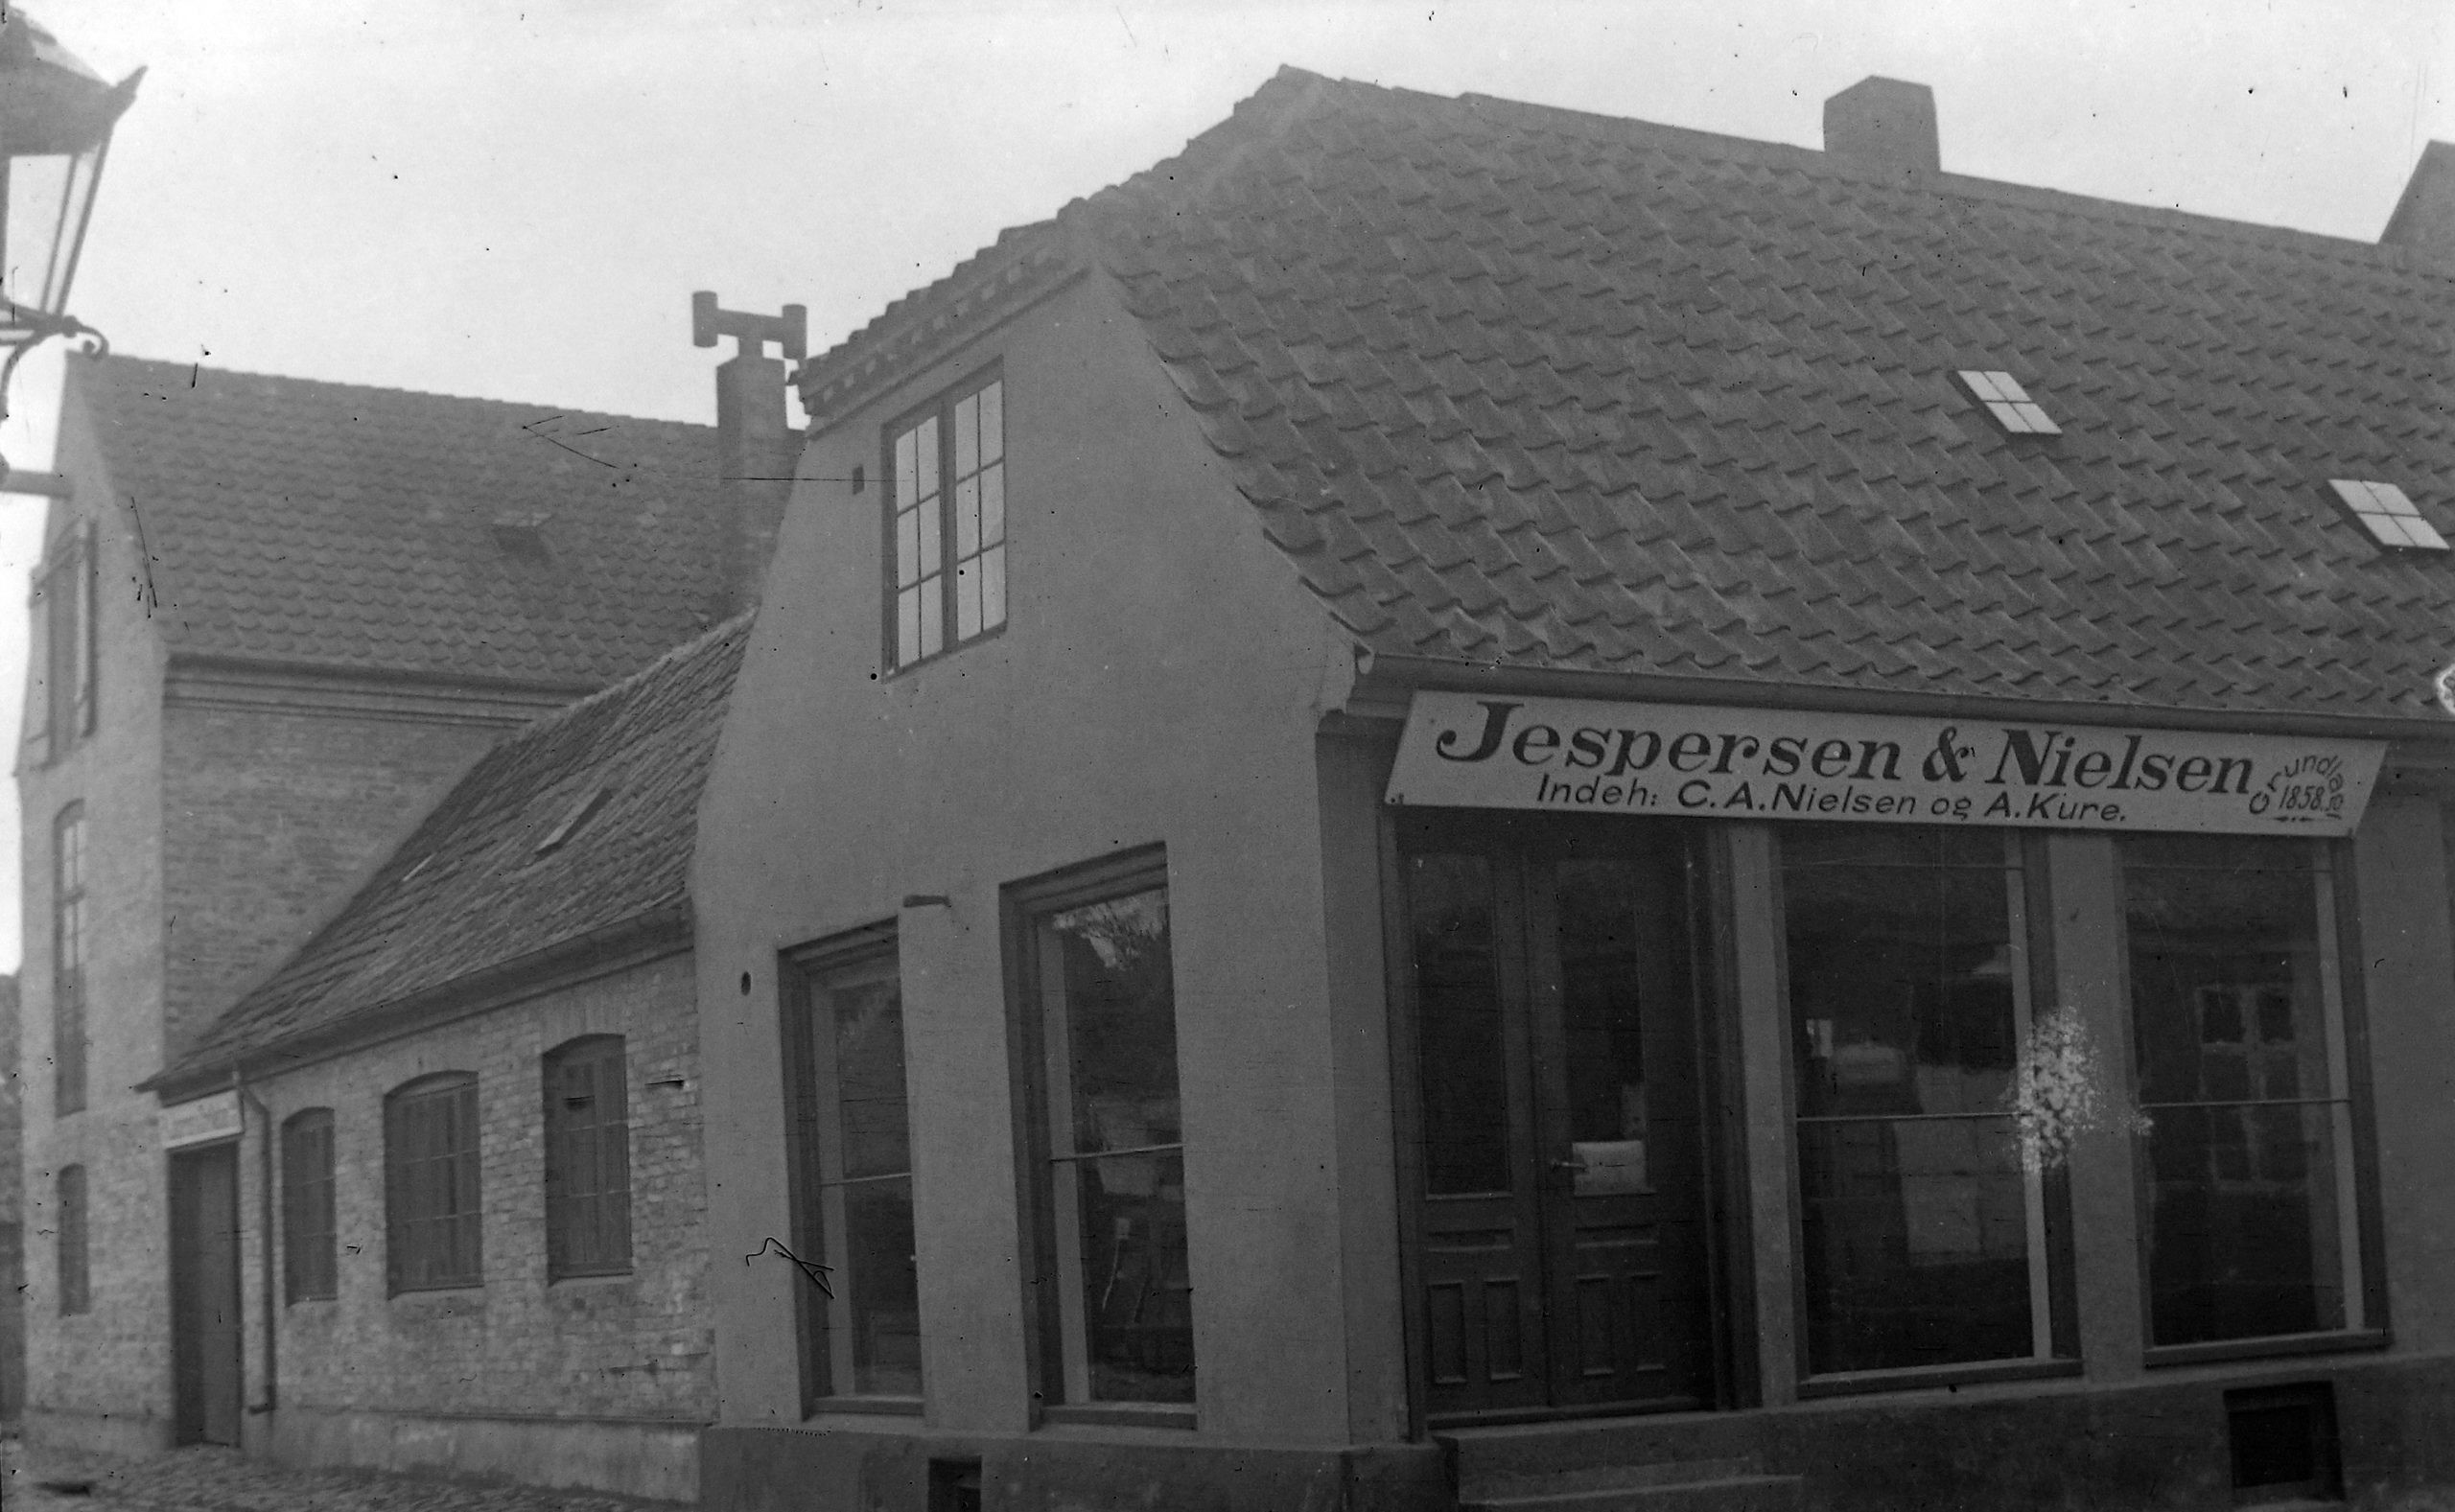 Snedkere Jespersen & Nielsen - 1910